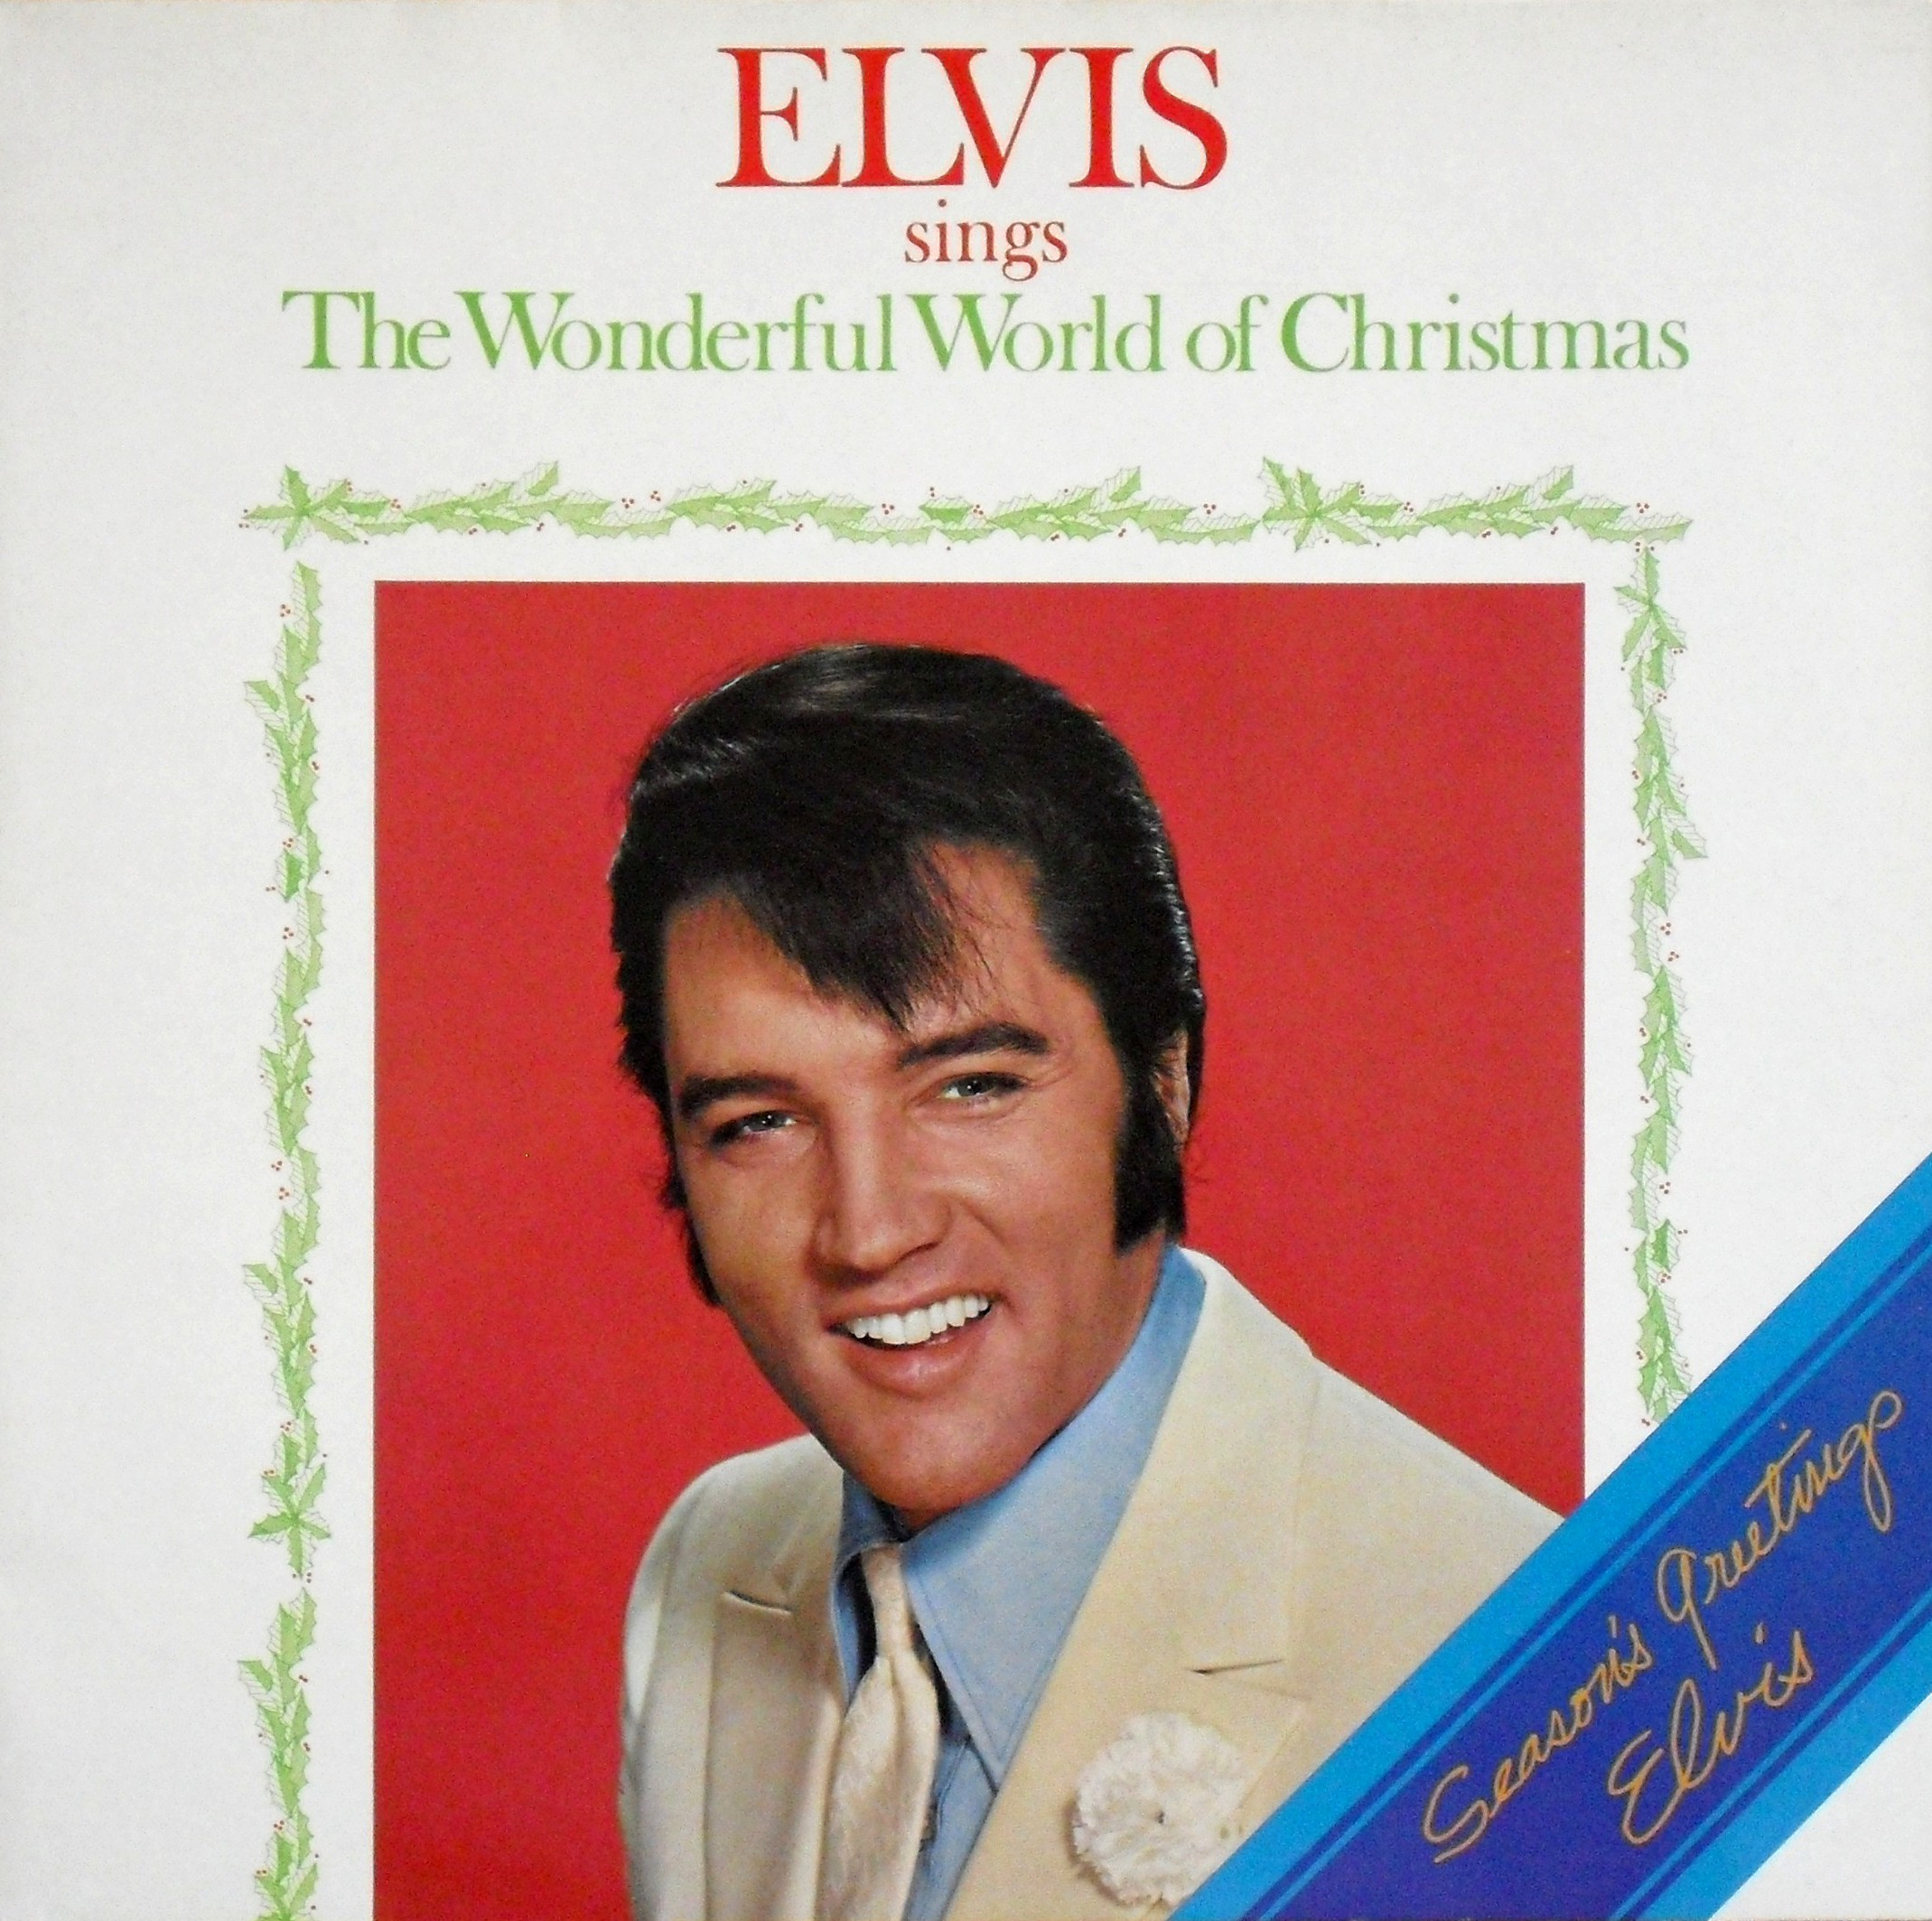 ELVIS SINGS THE WONDERFUL WORLD OF CHRISTMAS 01mzrld